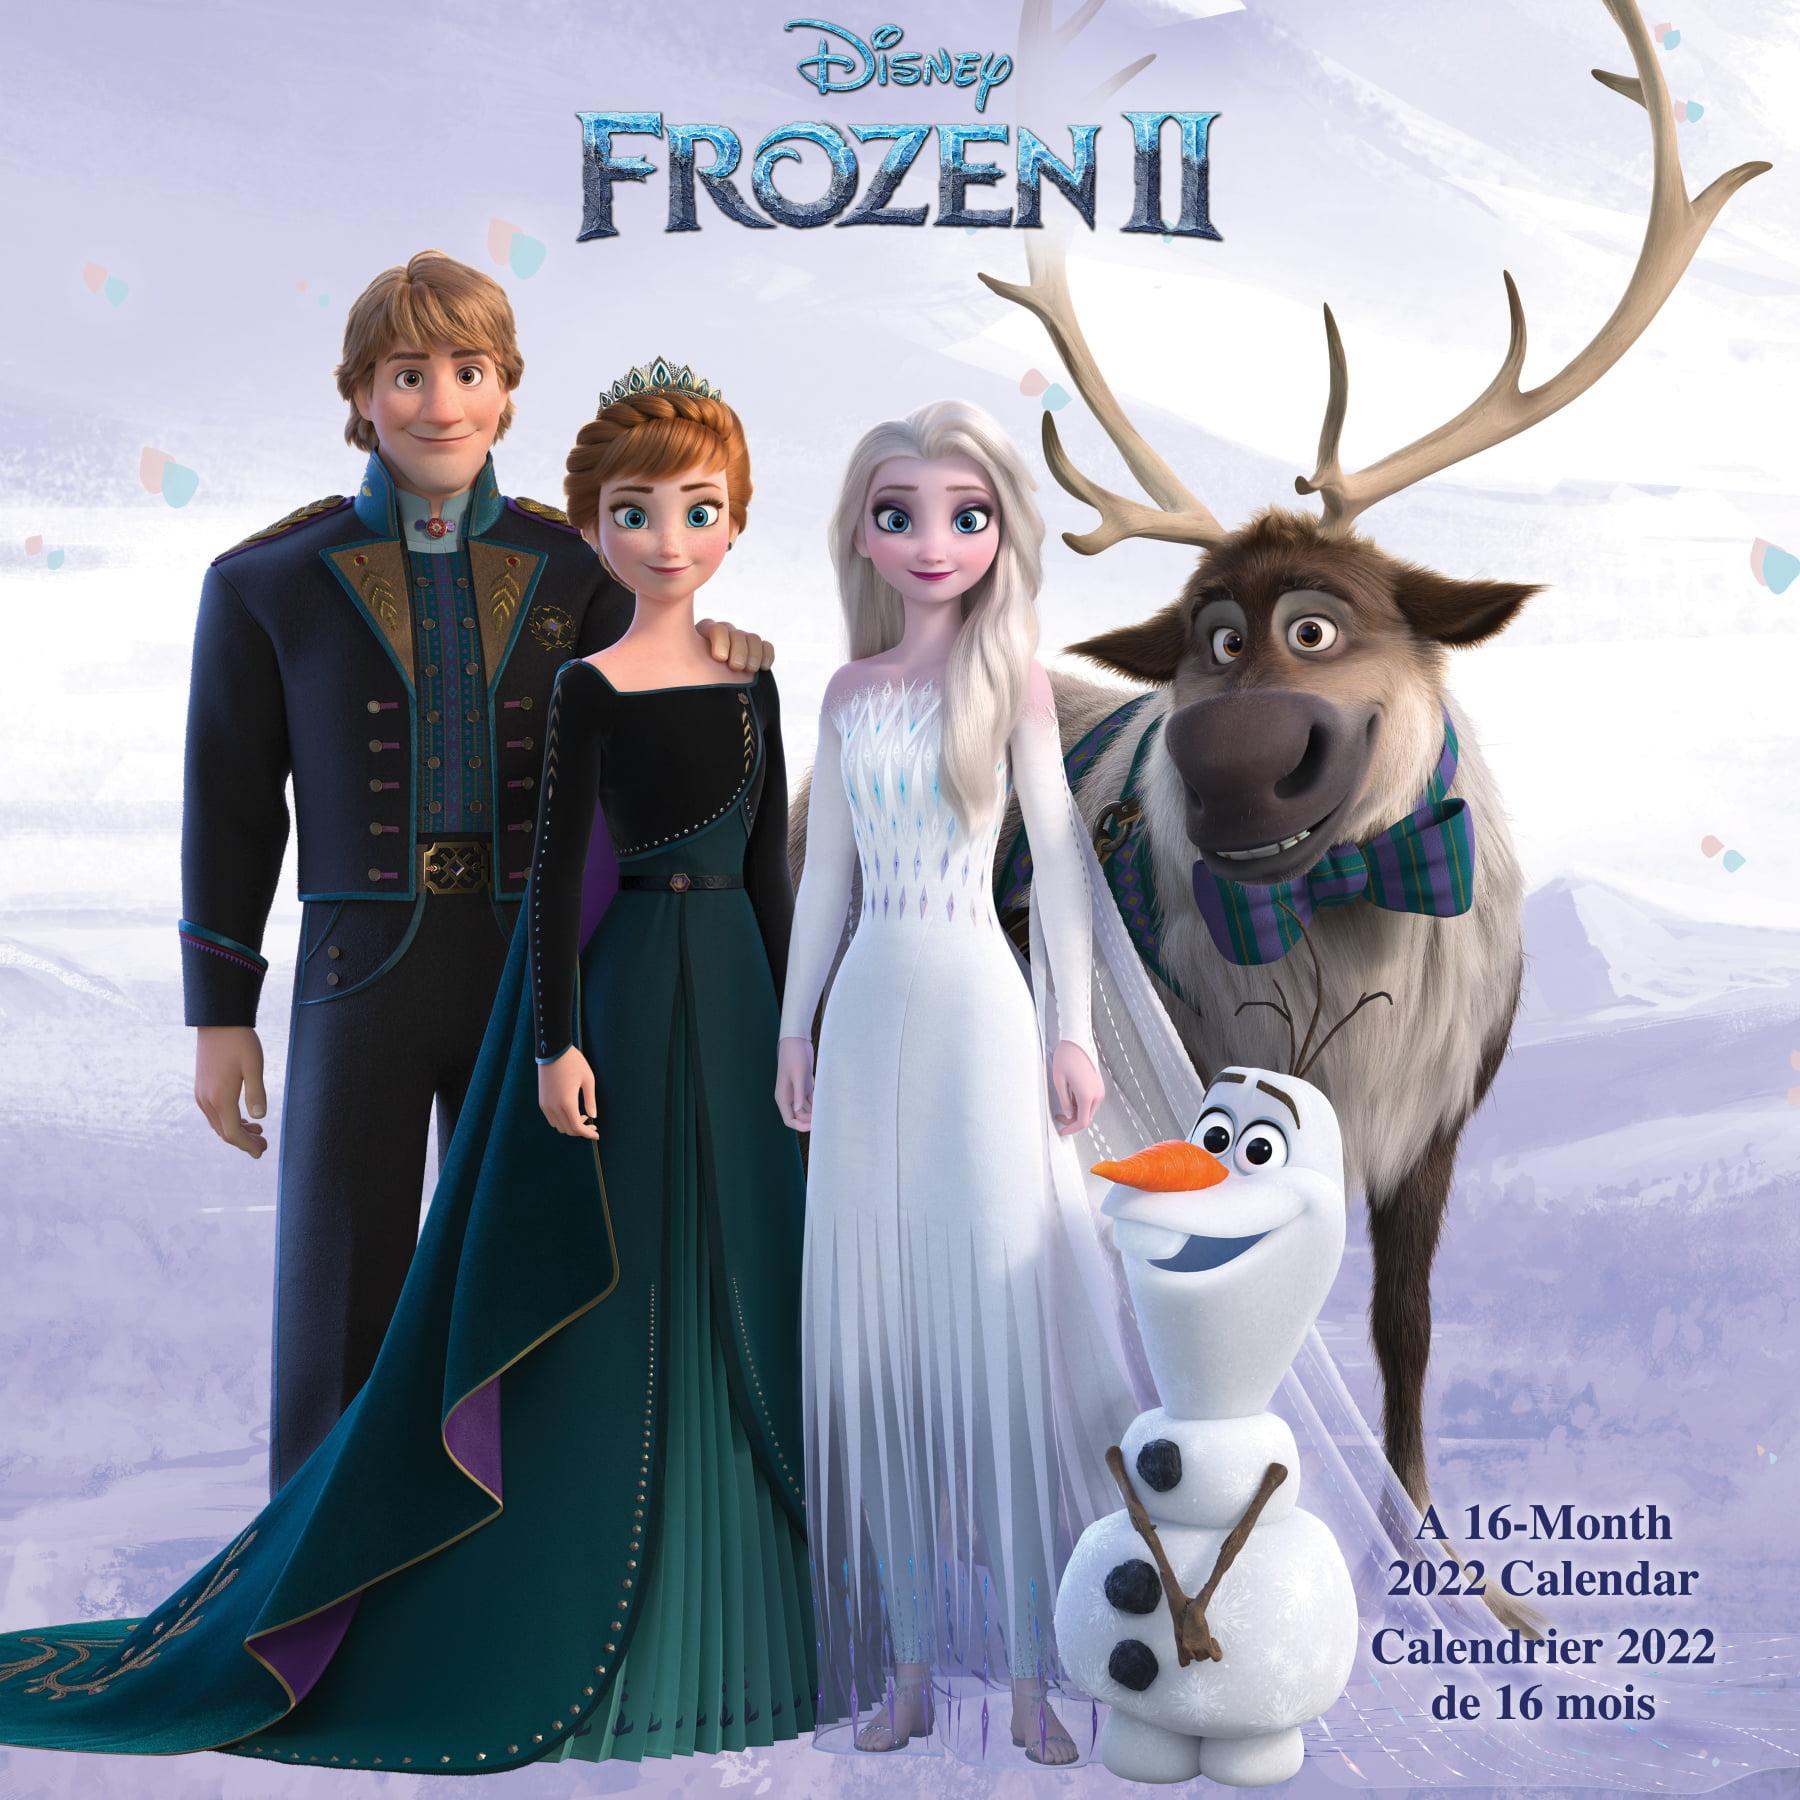 Calendrier Ultra Trail 2022 France 2022 Disney Frozen (Bilingual French) Wall Calendar   Walmart.